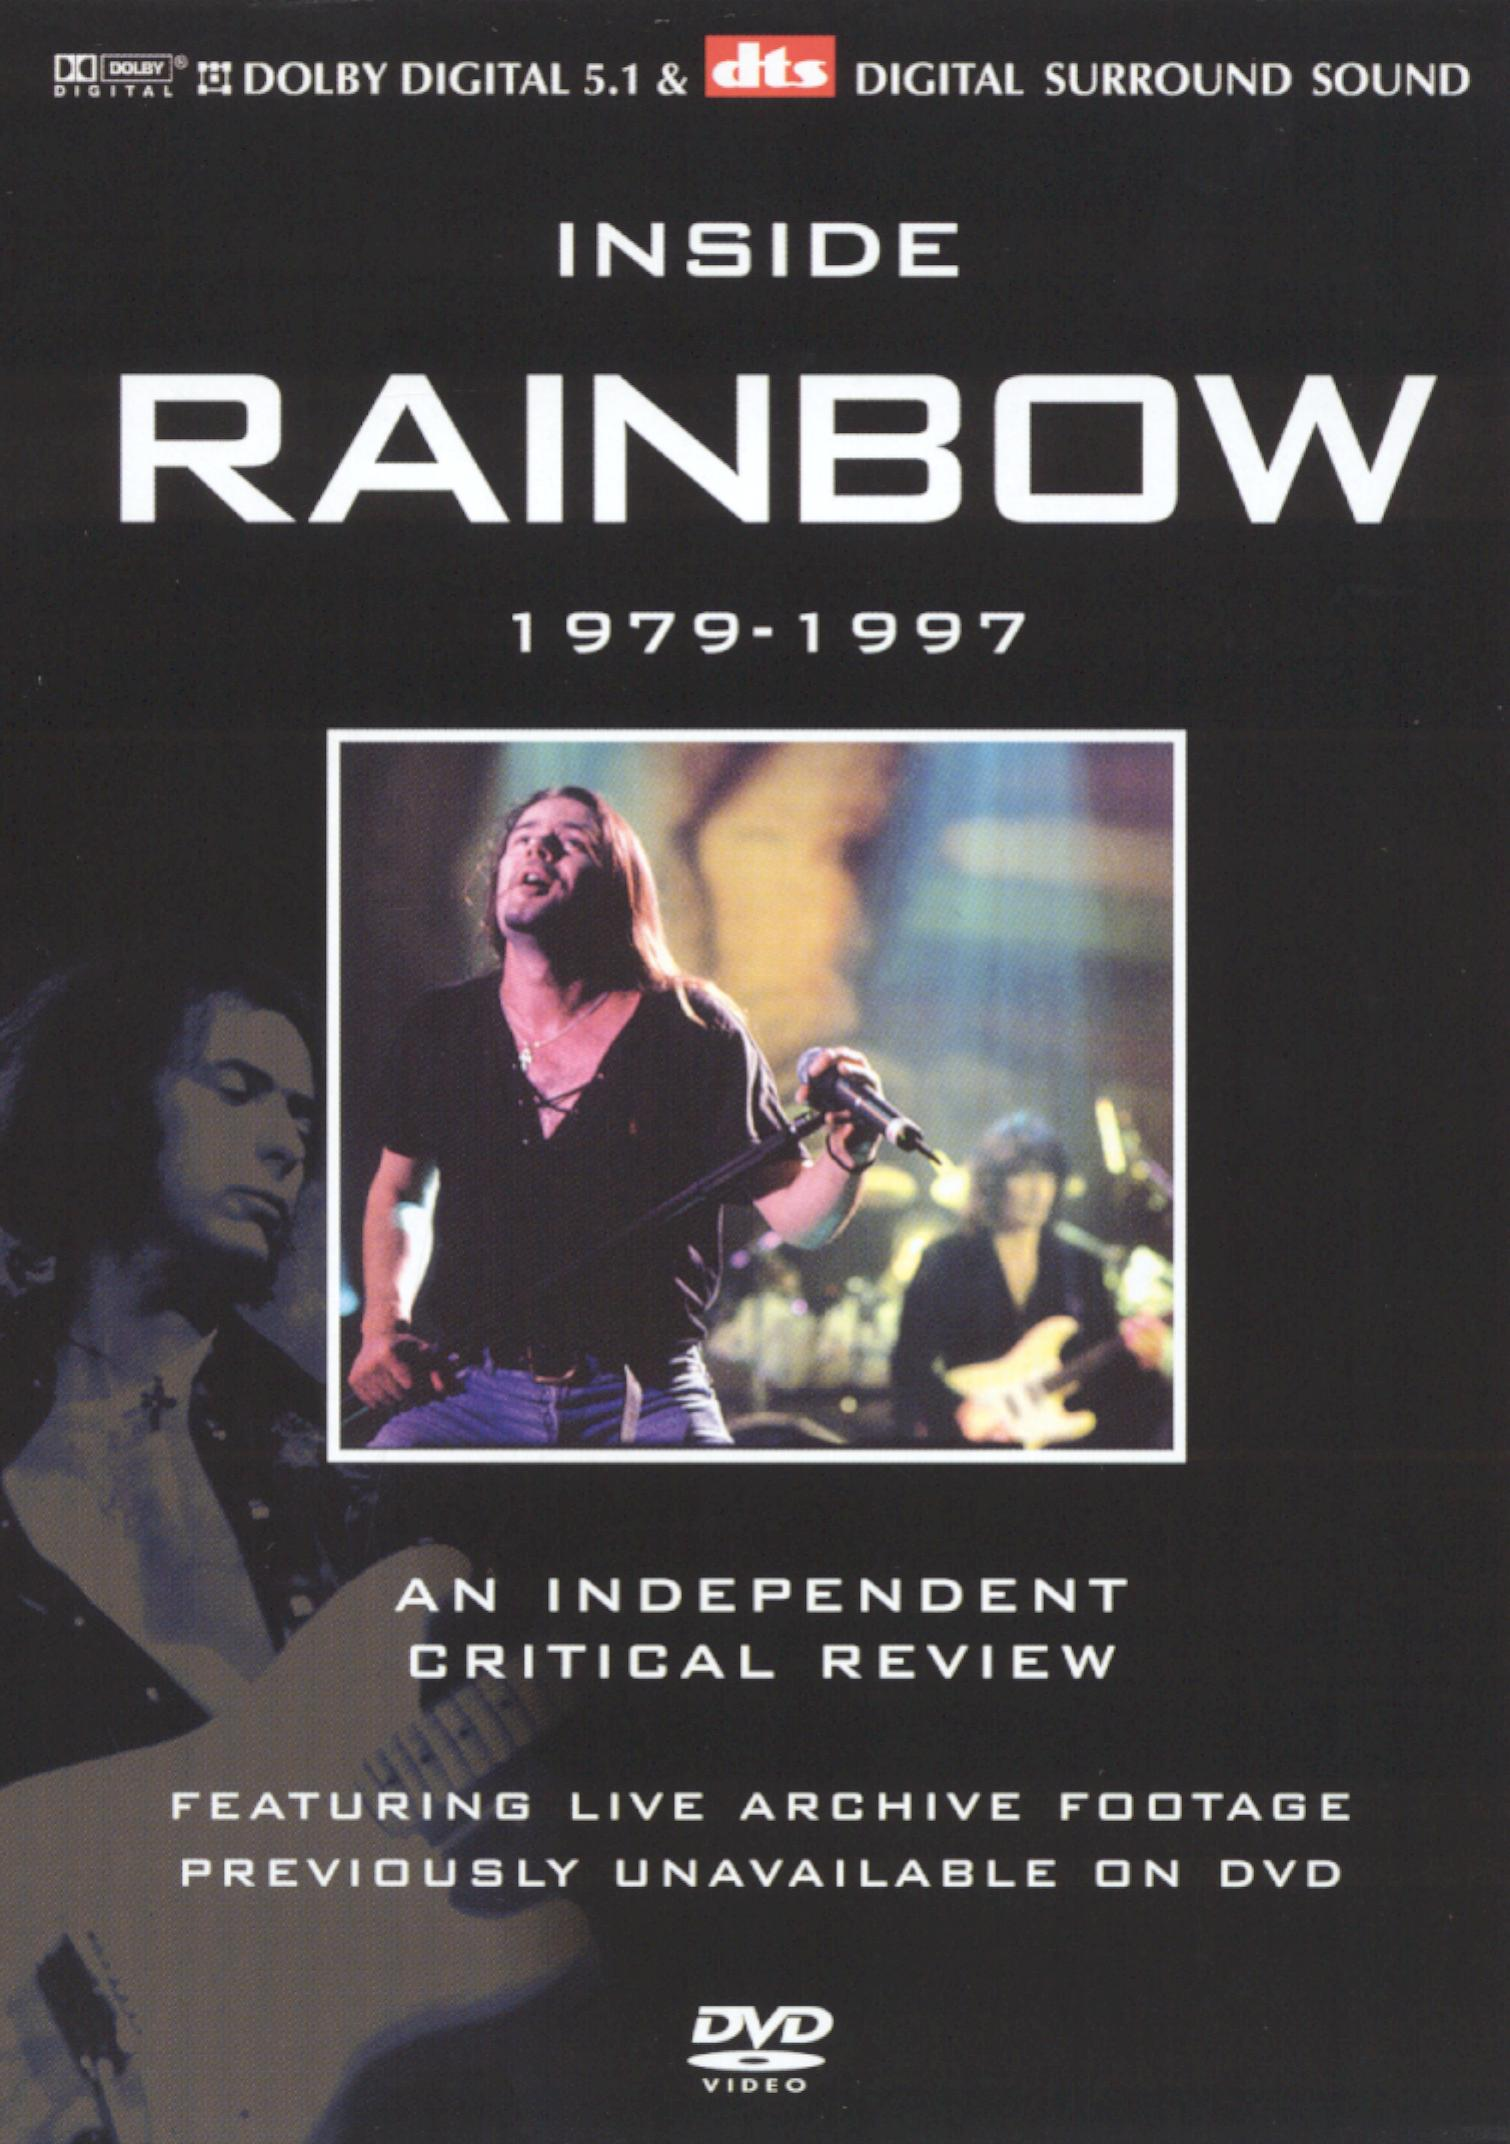 Inside Rainbow: A Critical Review, Vol. 2: 1979-1997